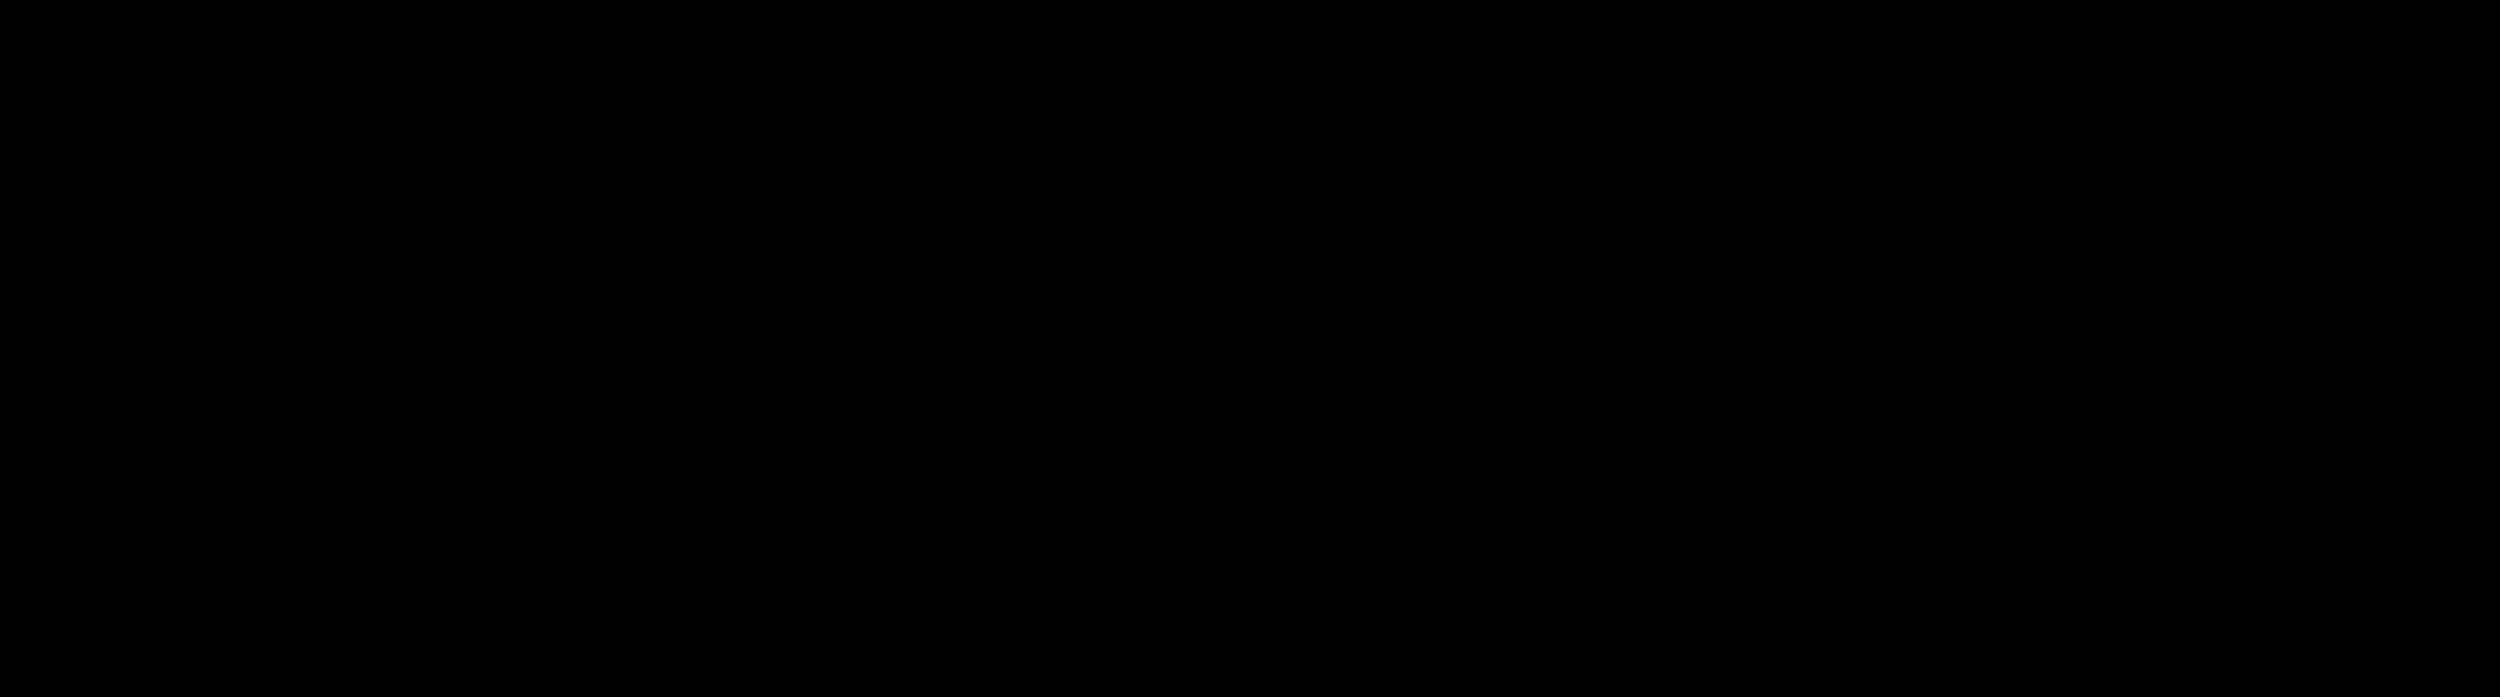 oztix-logo-cmyk-nopos-black.png